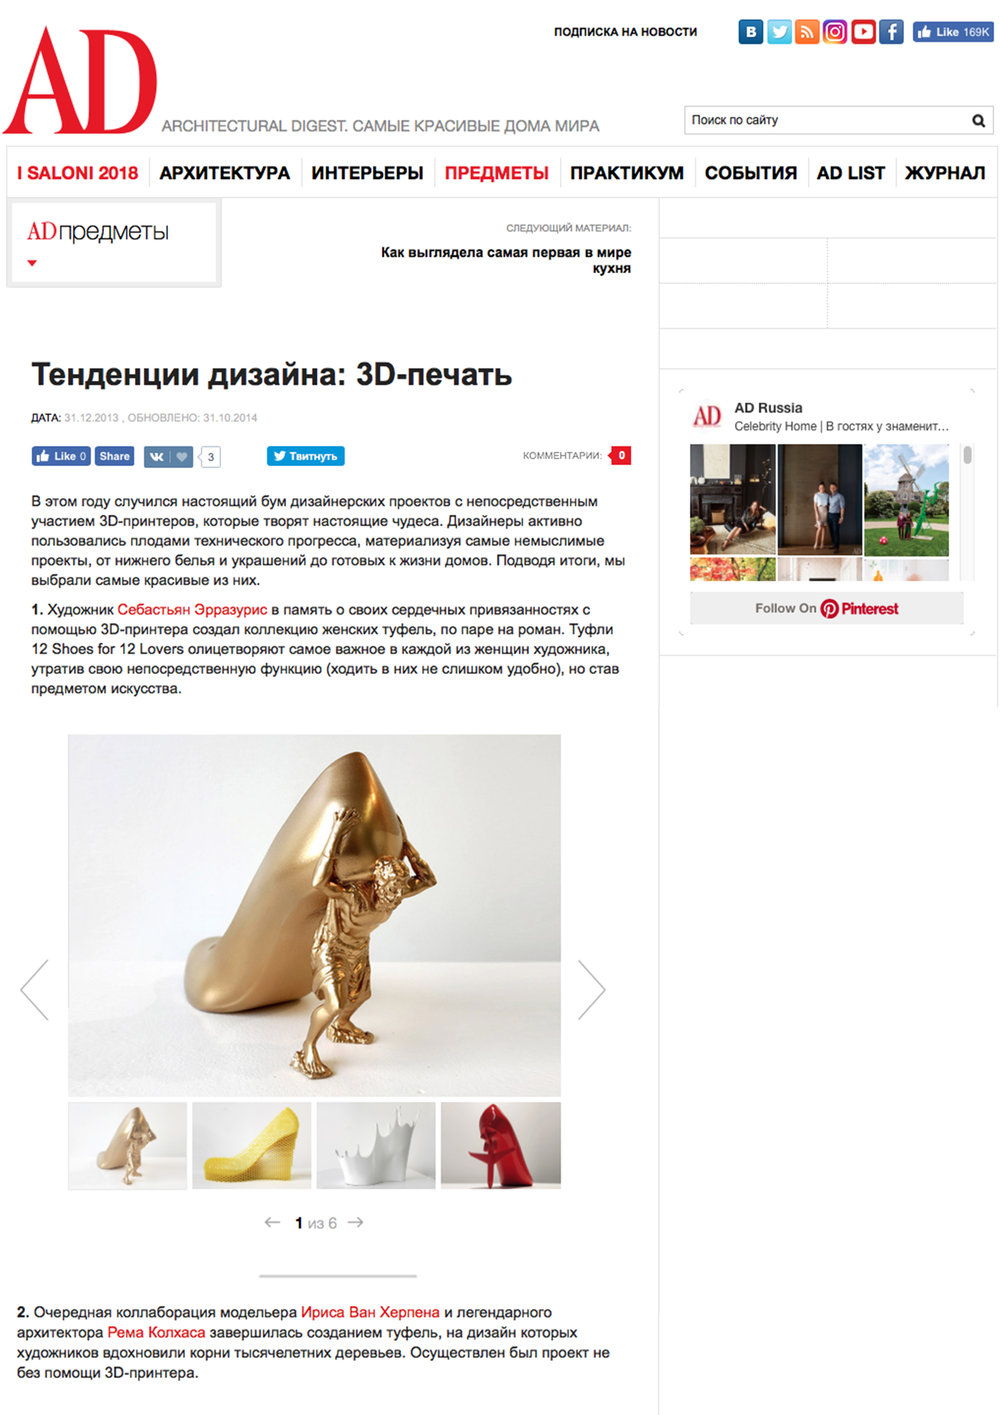 AD_RUSIAN2017.jpg